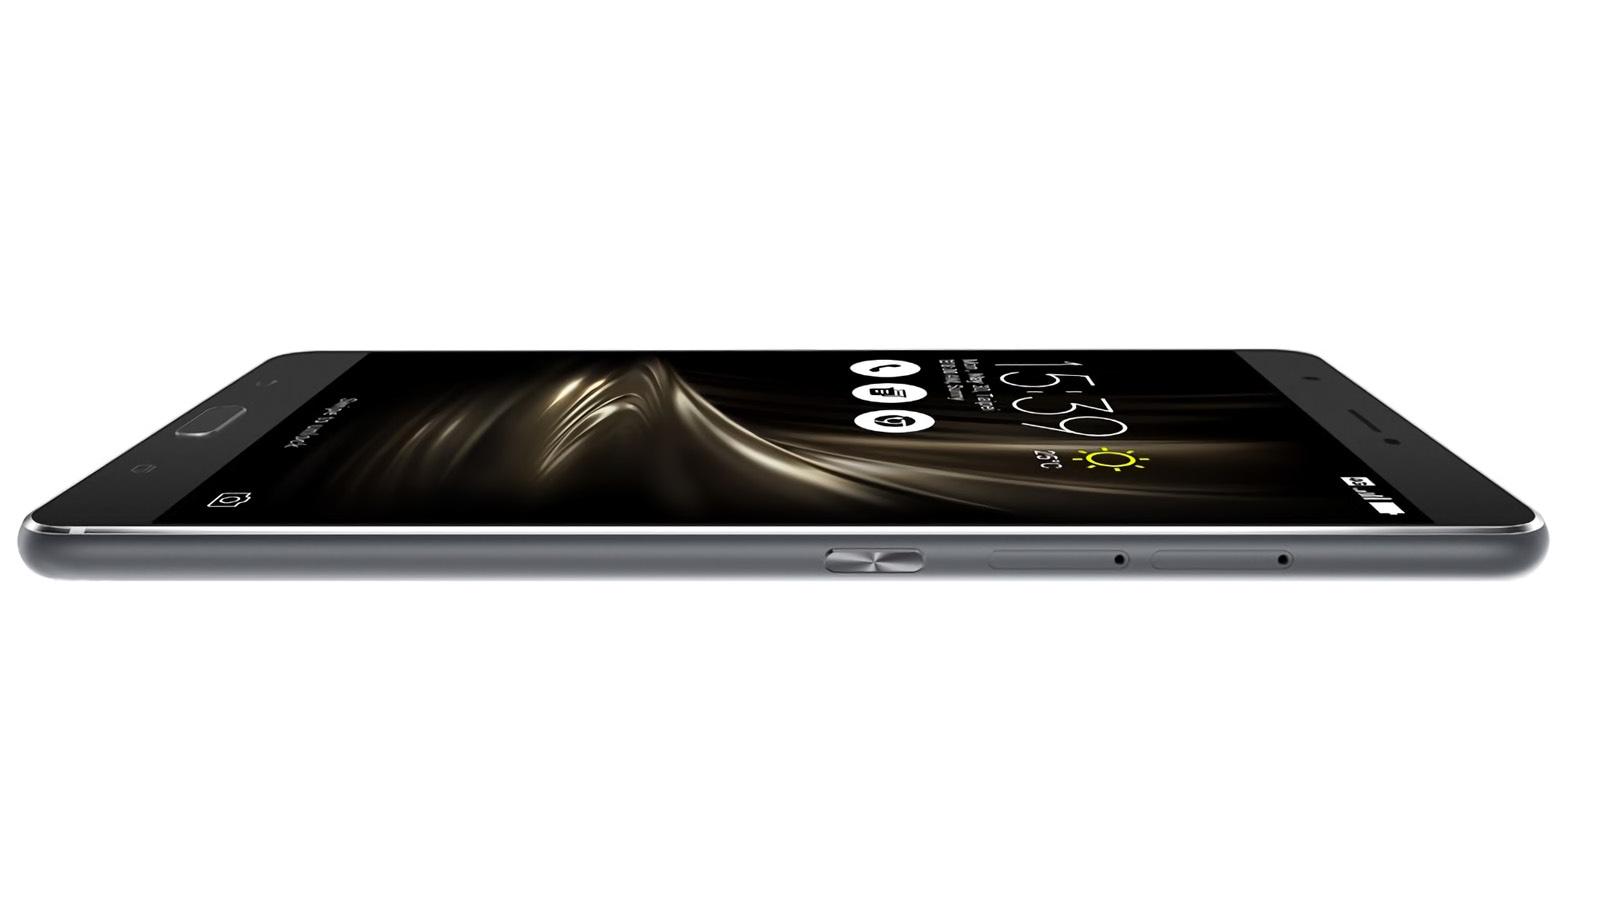 ASUS ZenFone 3 Ultra 本体厚み